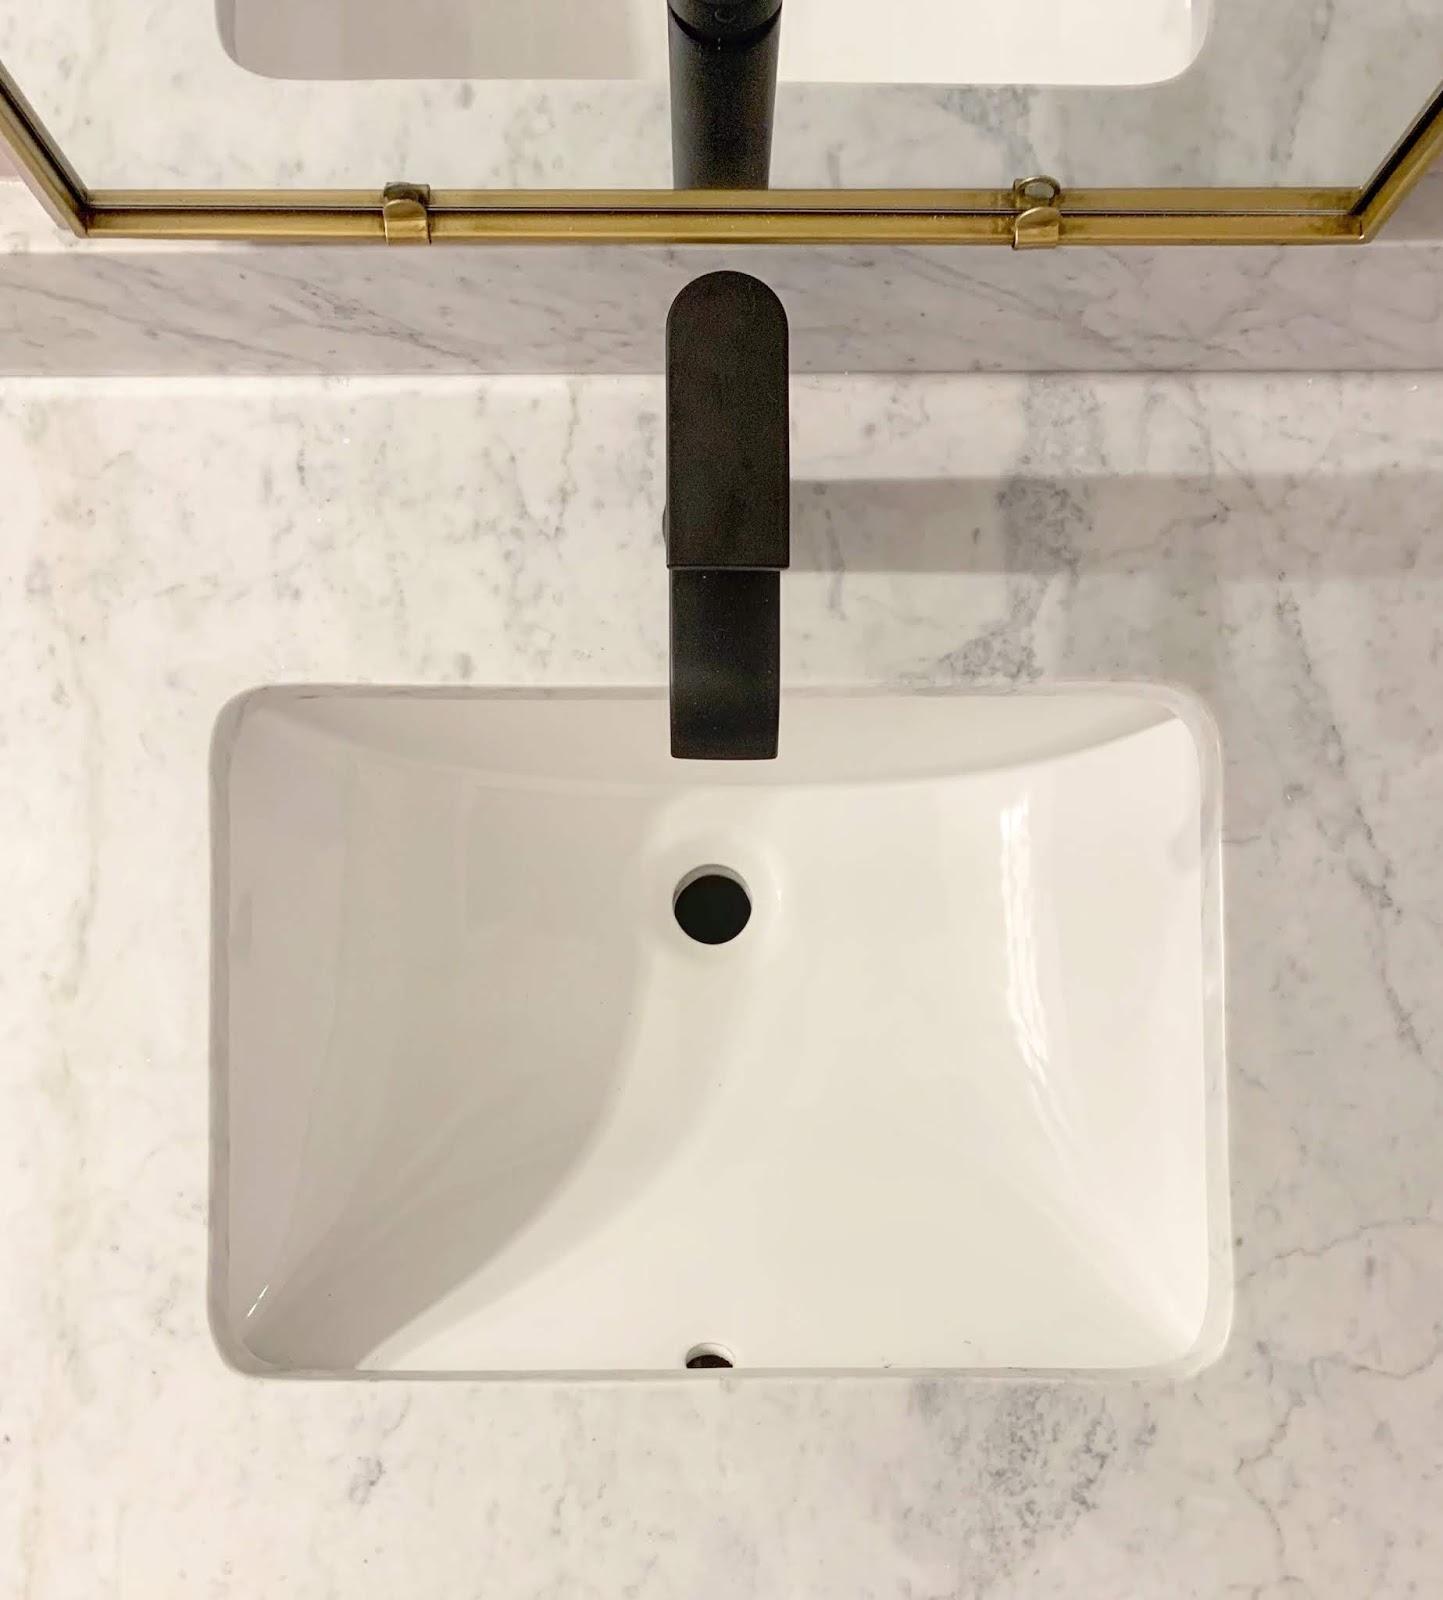 Primp and Pamper Bathroom Makeover sponsored by Signature Hardware and Build.com | House Homemade